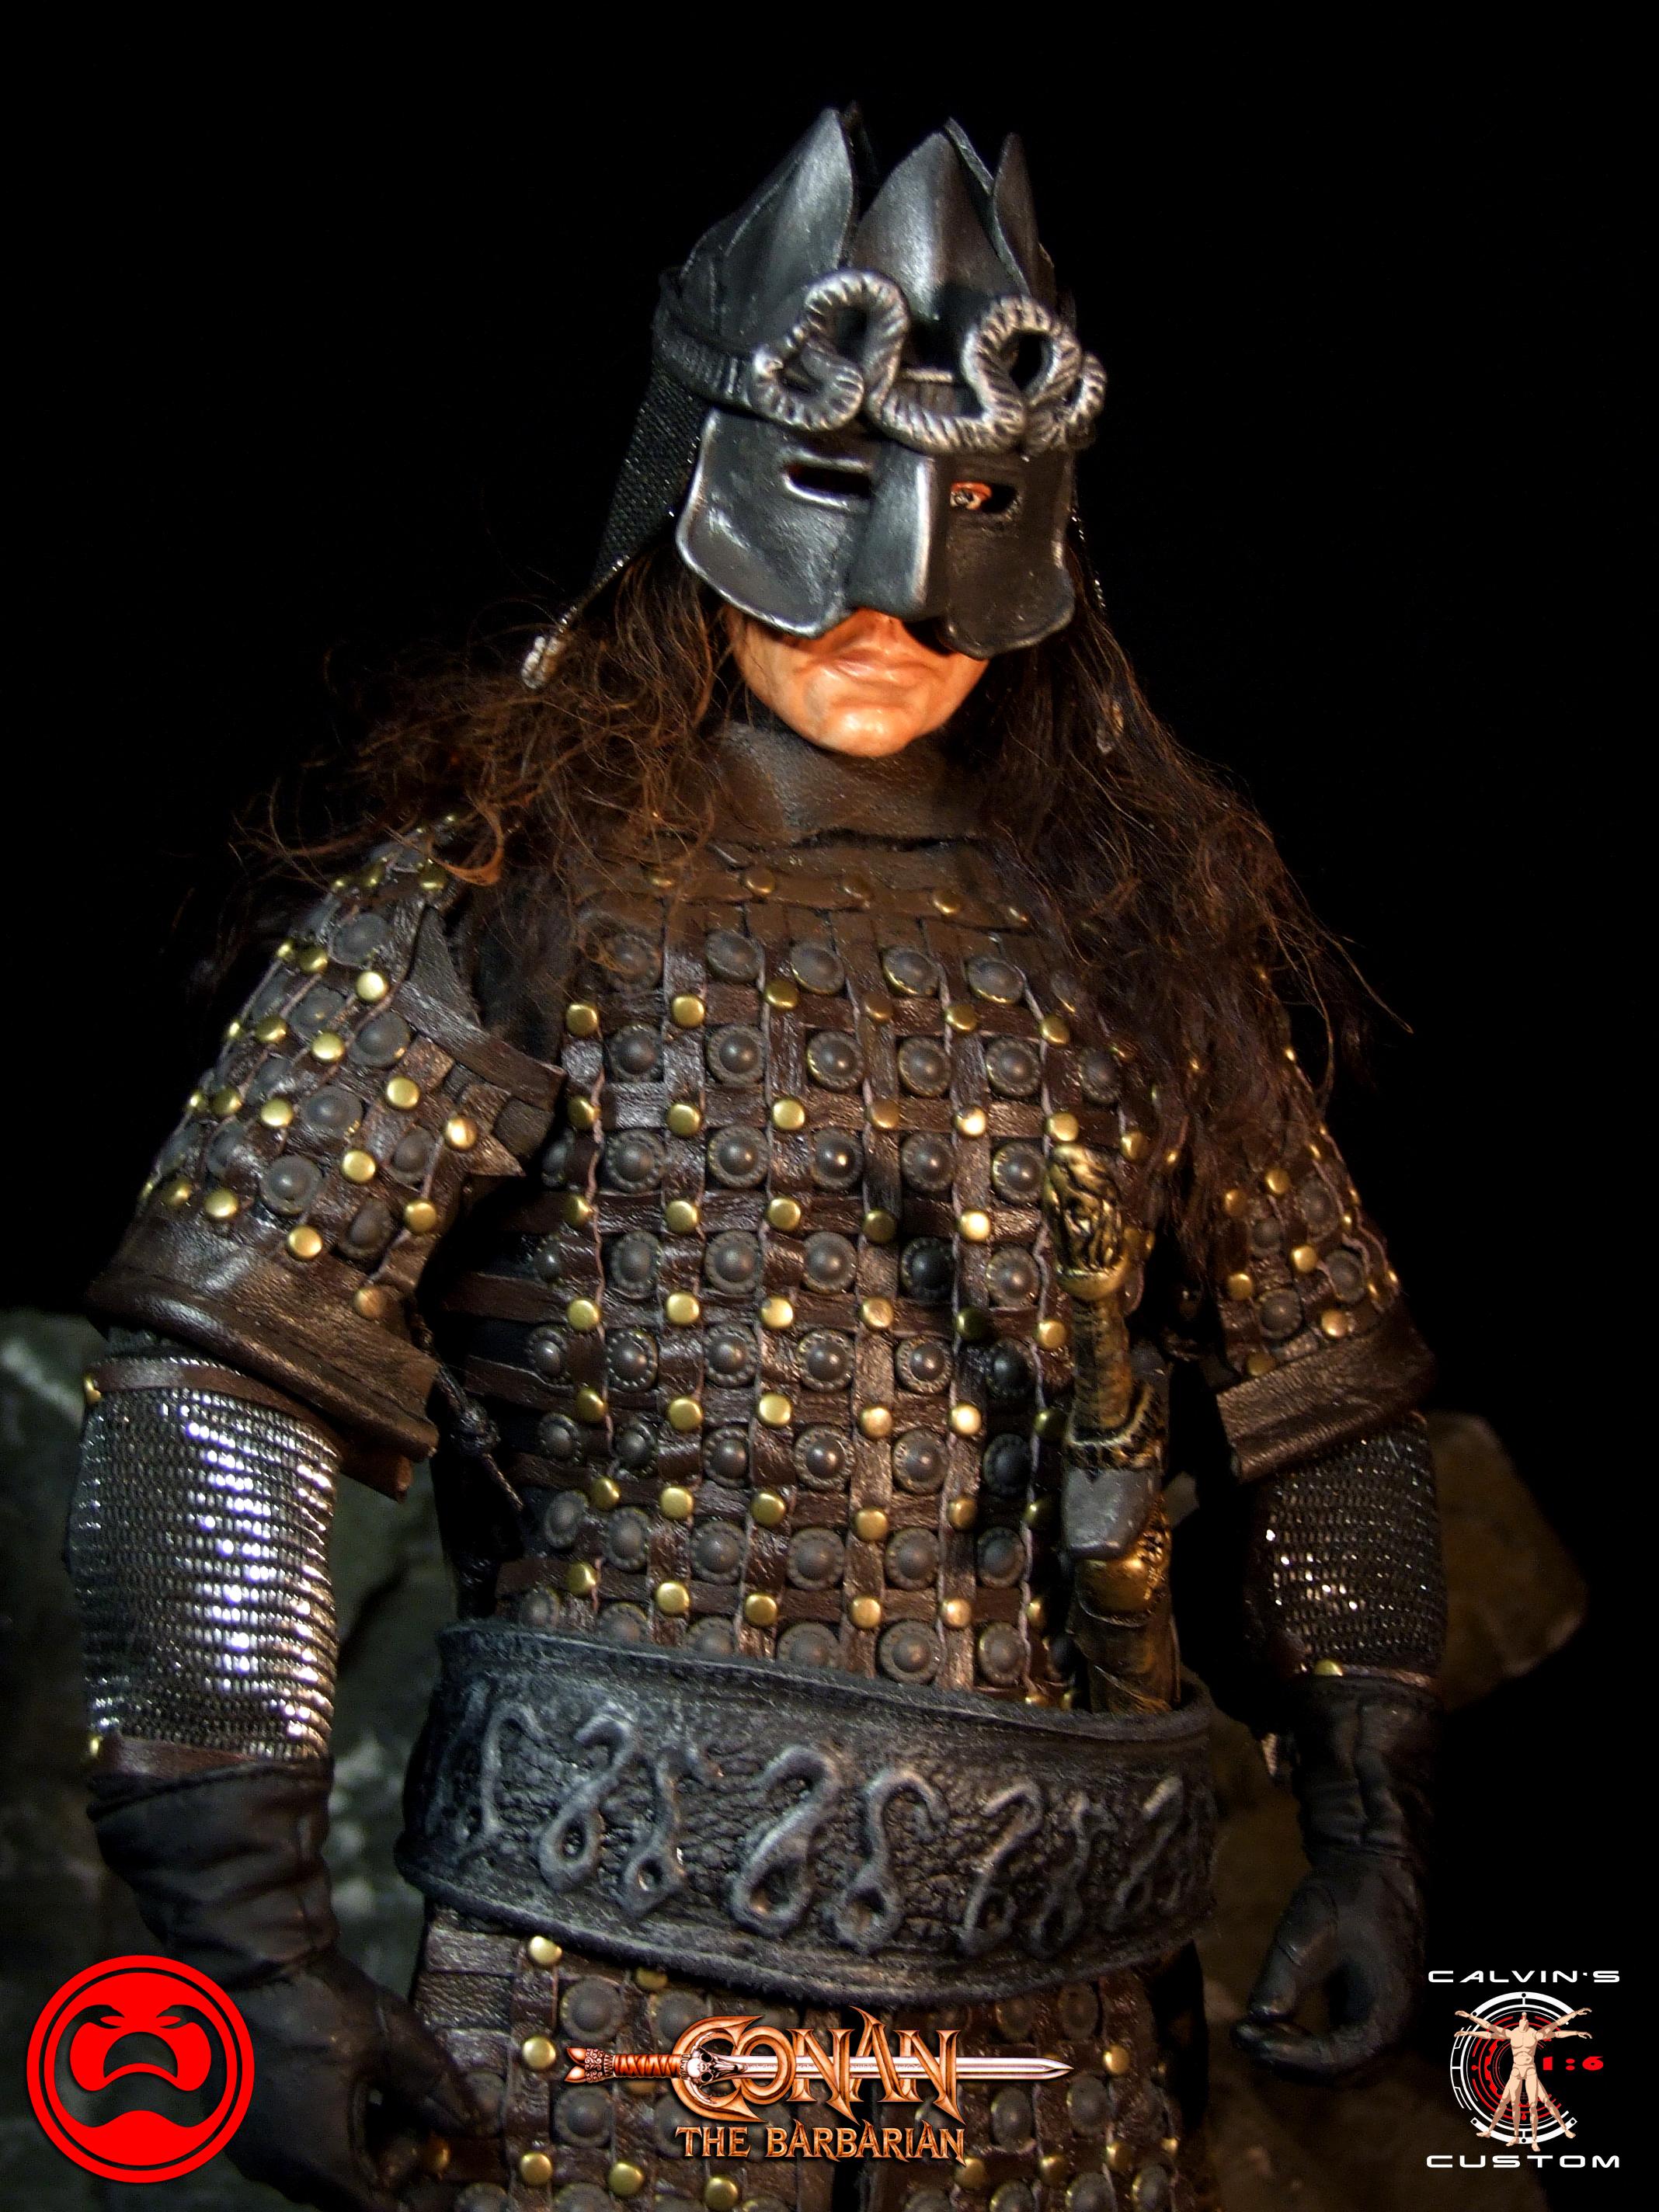 Conan 2011 Cool conan the barbarian (2011) immagini calvin's custom 1/6 one sixth